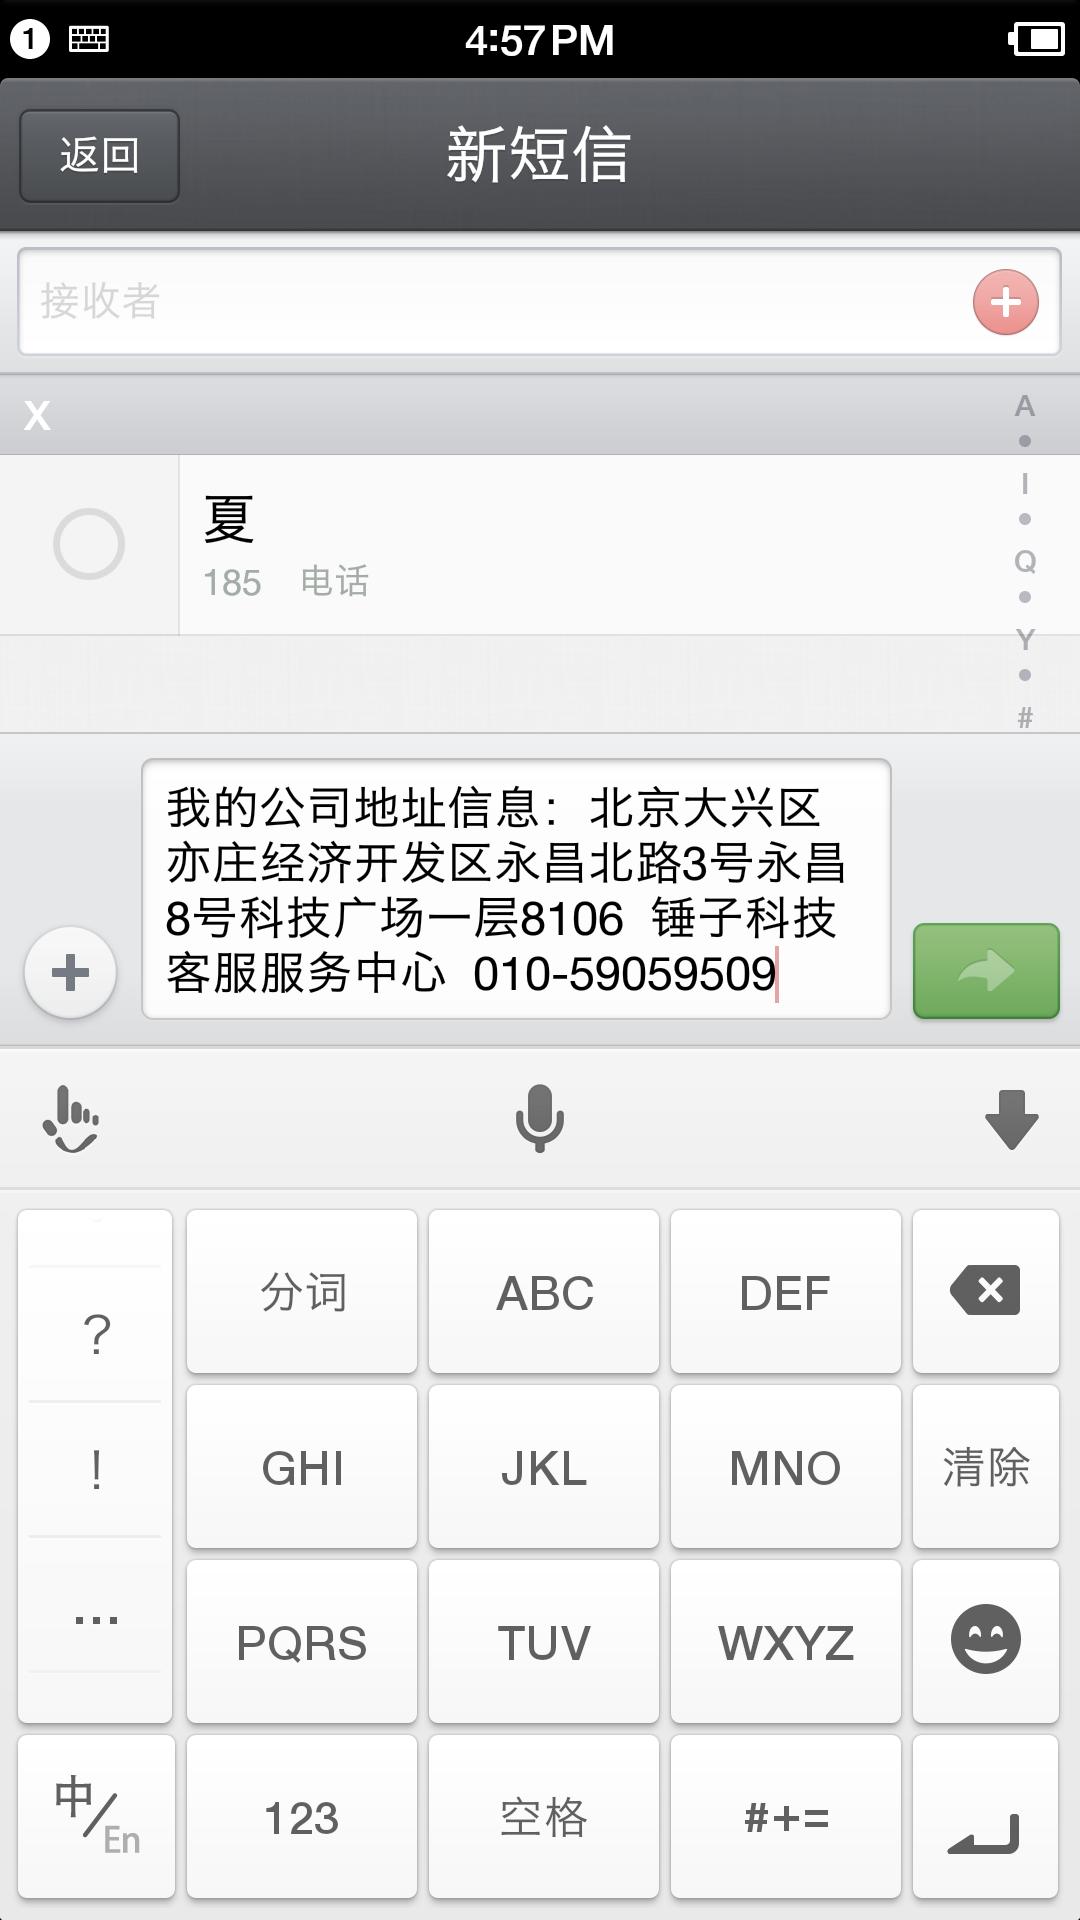 Screenshot_2015-11-03-16-57-34-166_短信.png